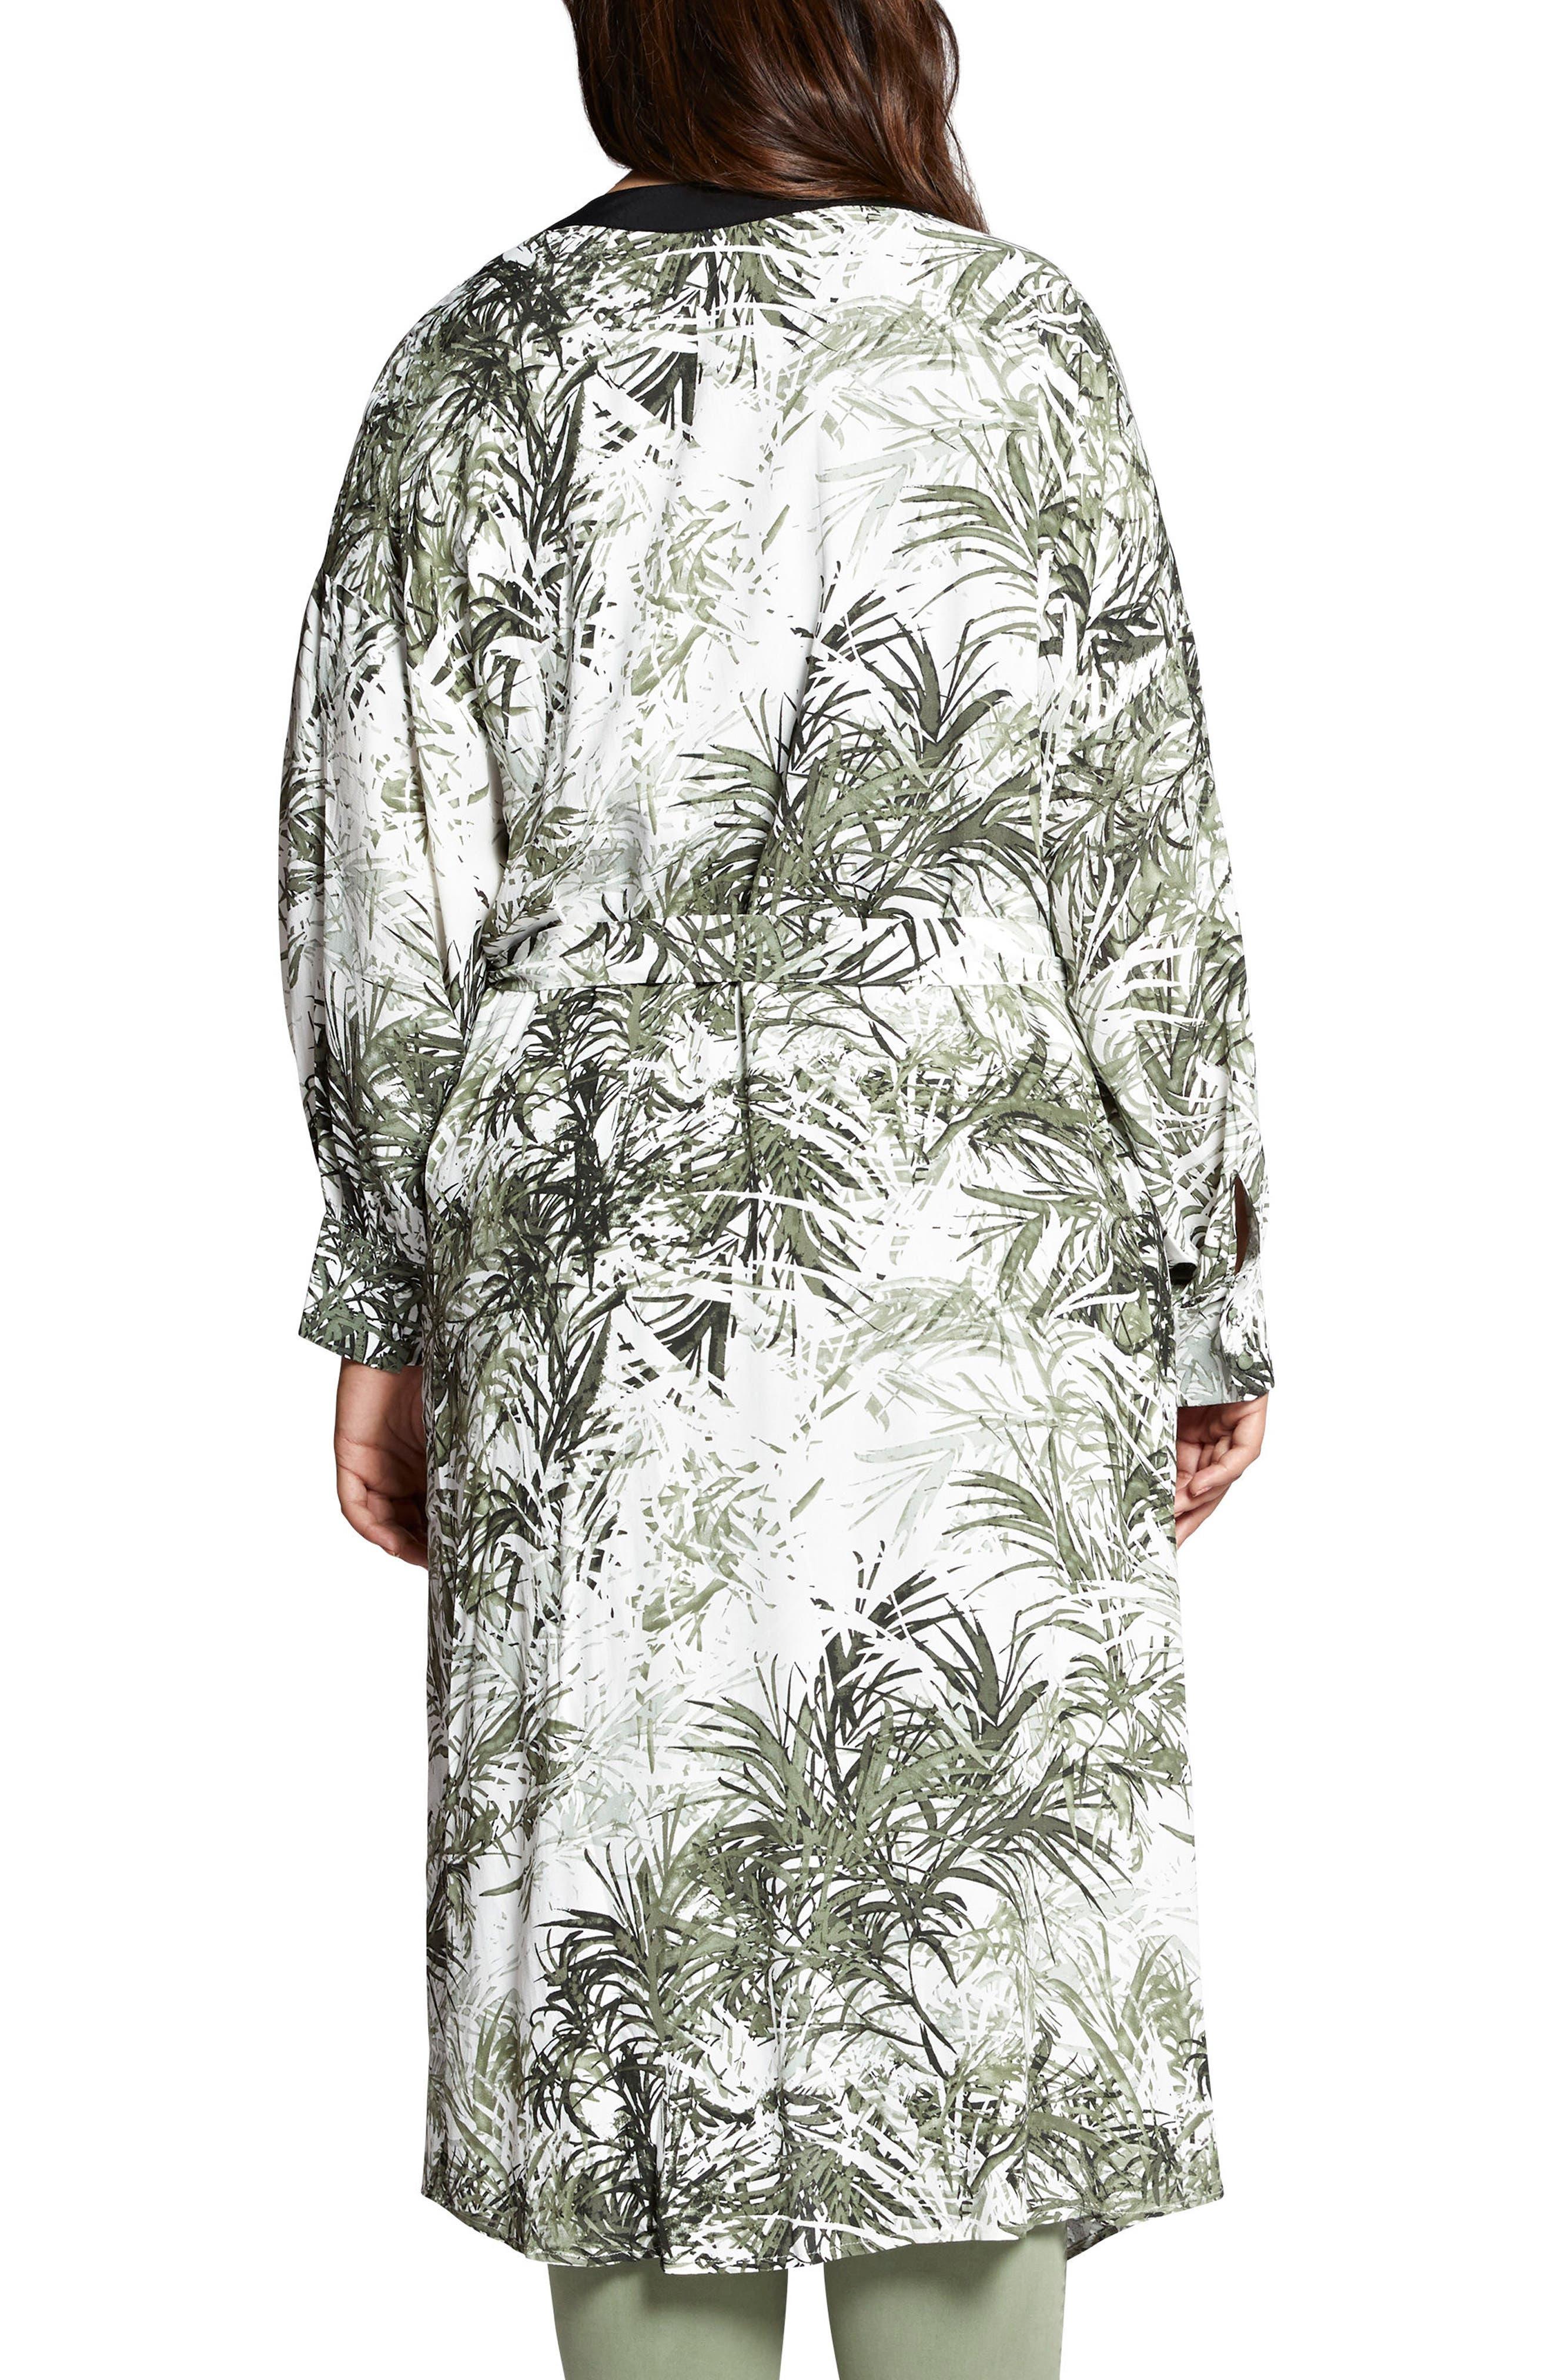 Calico Kimono,                             Alternate thumbnail 9, color,                             306